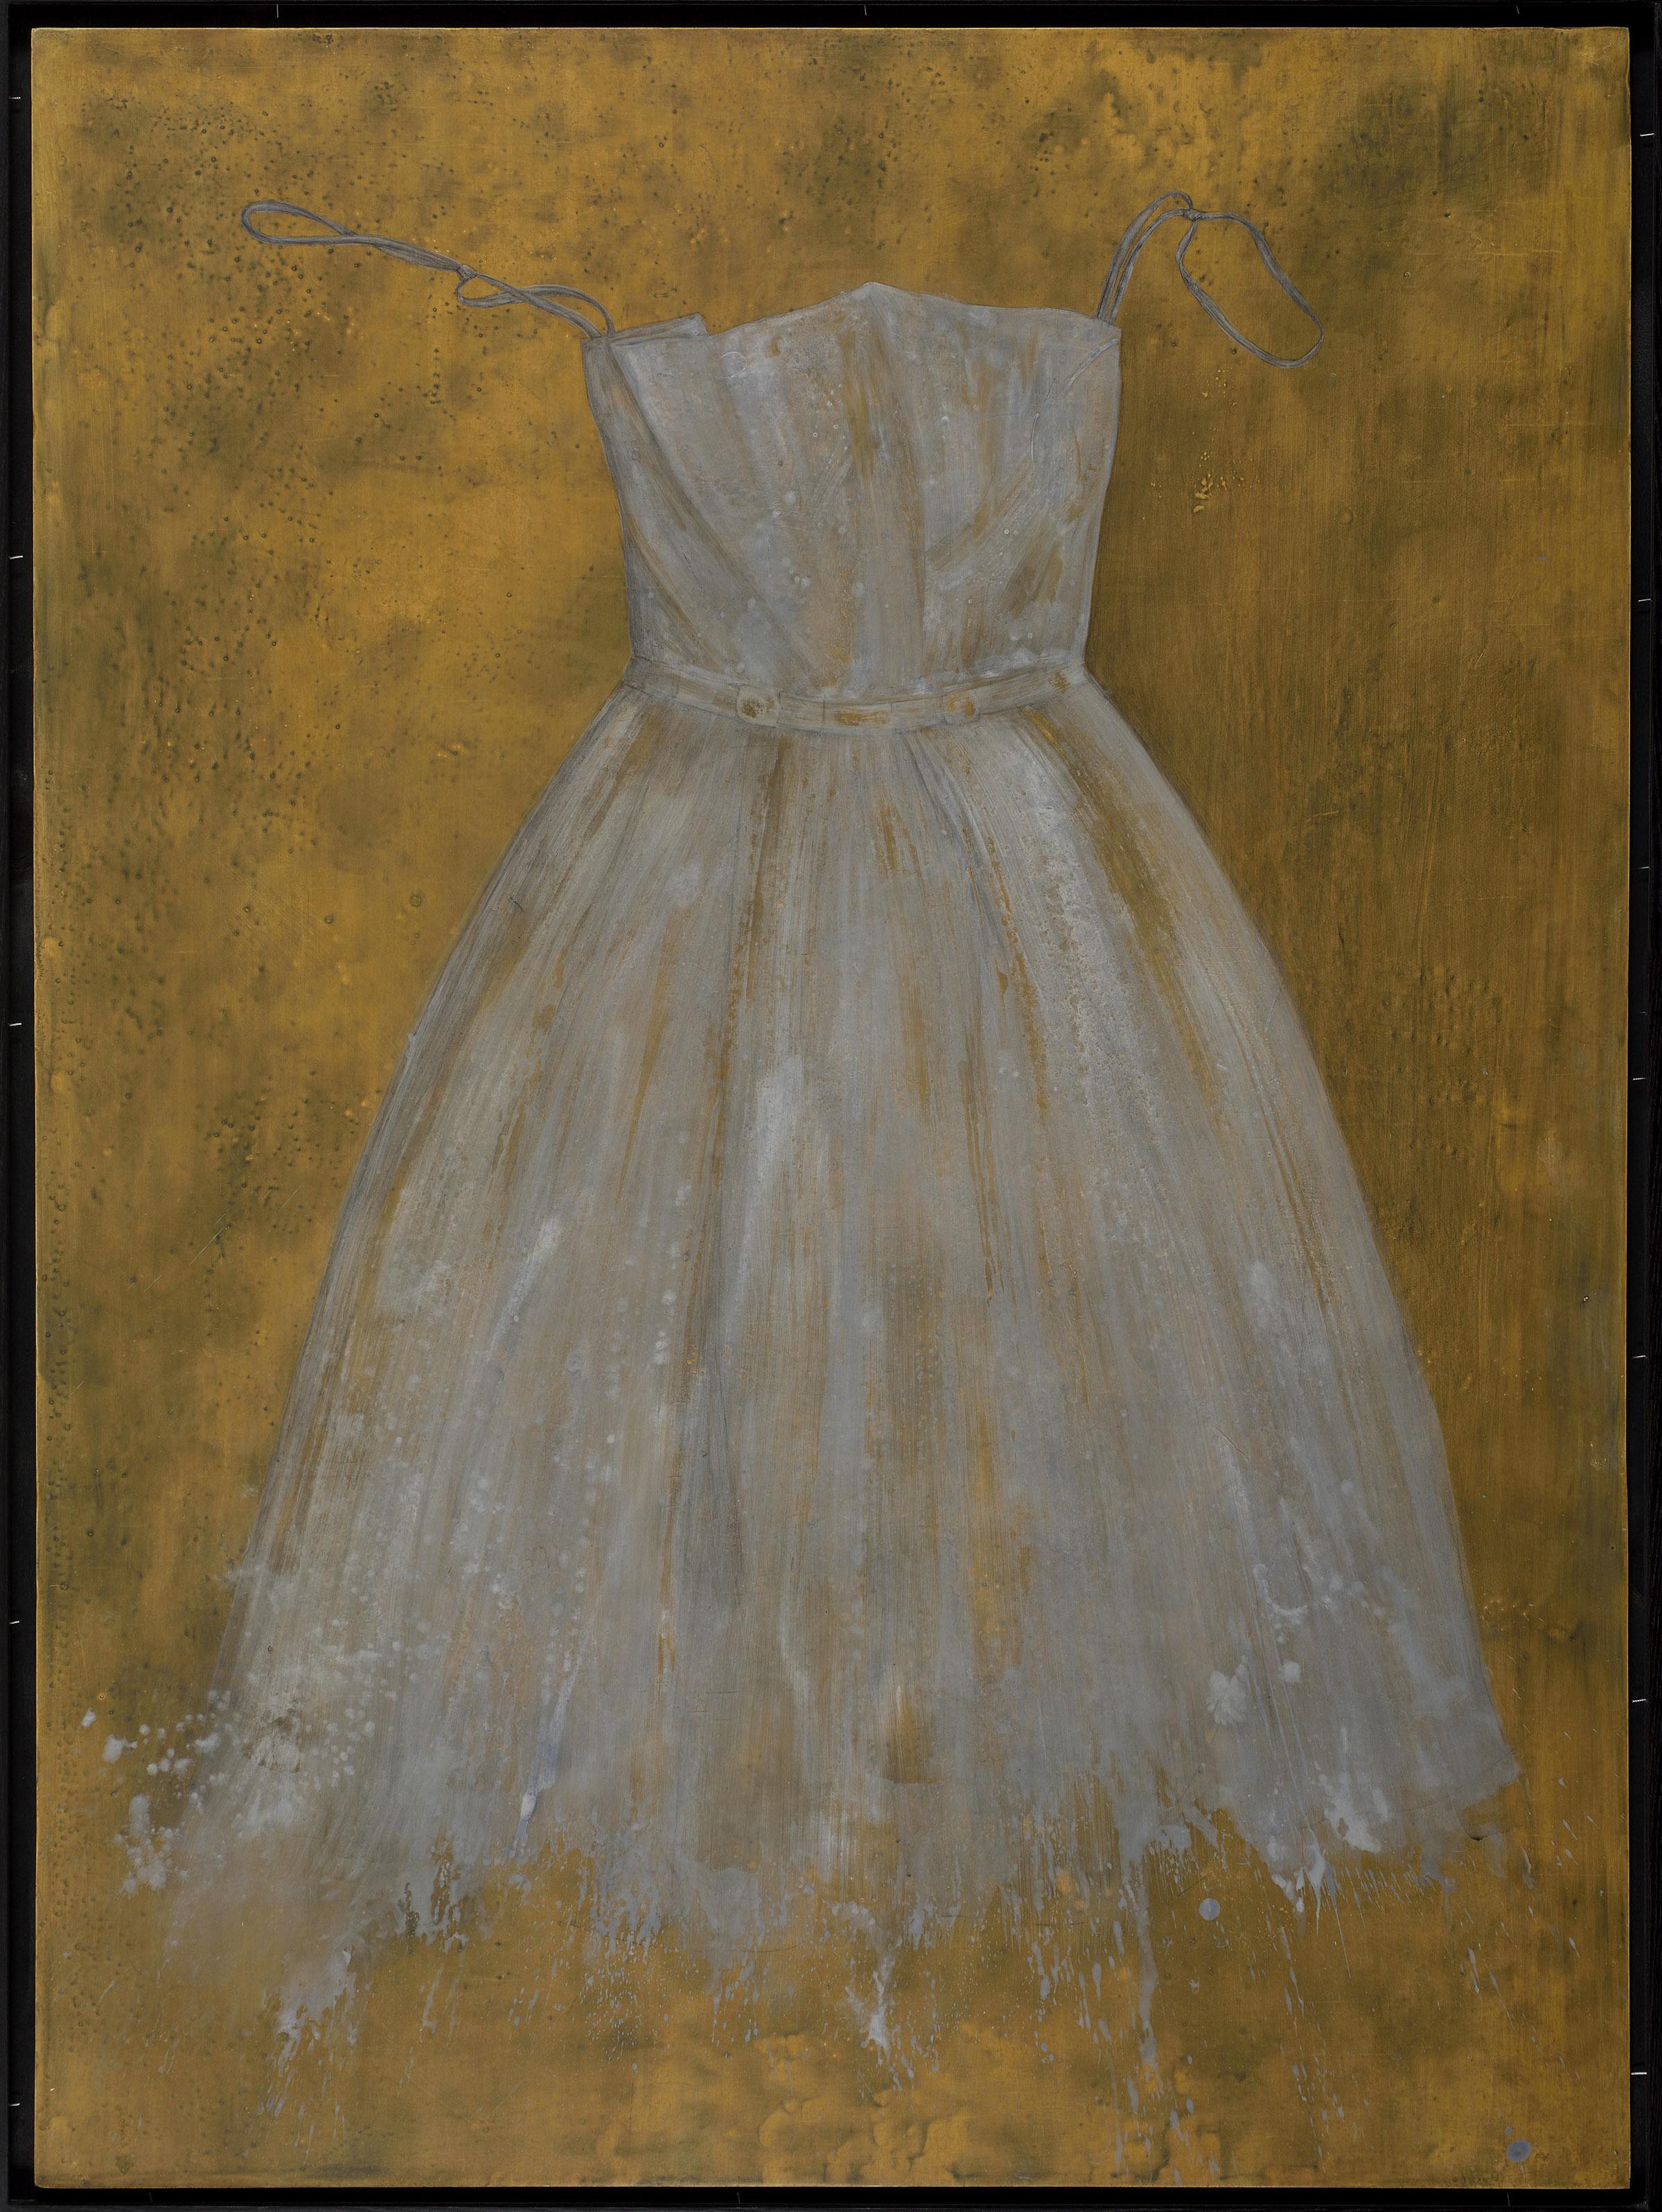 Dress II - egg tempera on gessoed panel 122 x 90 cm